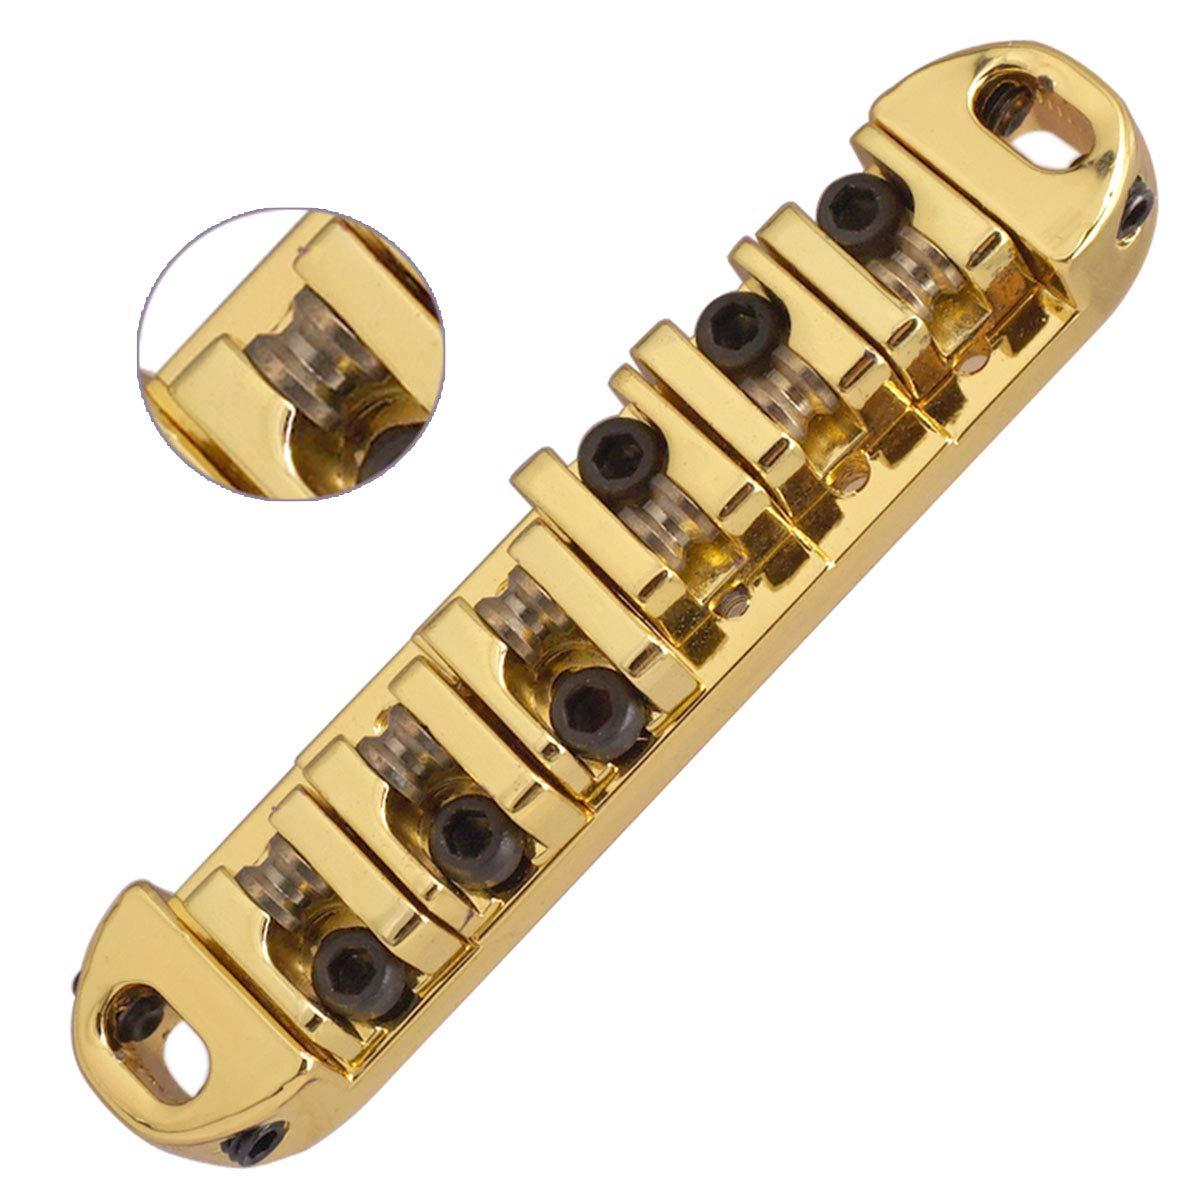 Vencetmat Abr-1 Style Guitar Bridge Saddle Roller for Gibson Les Paul Parts Replacement Gold